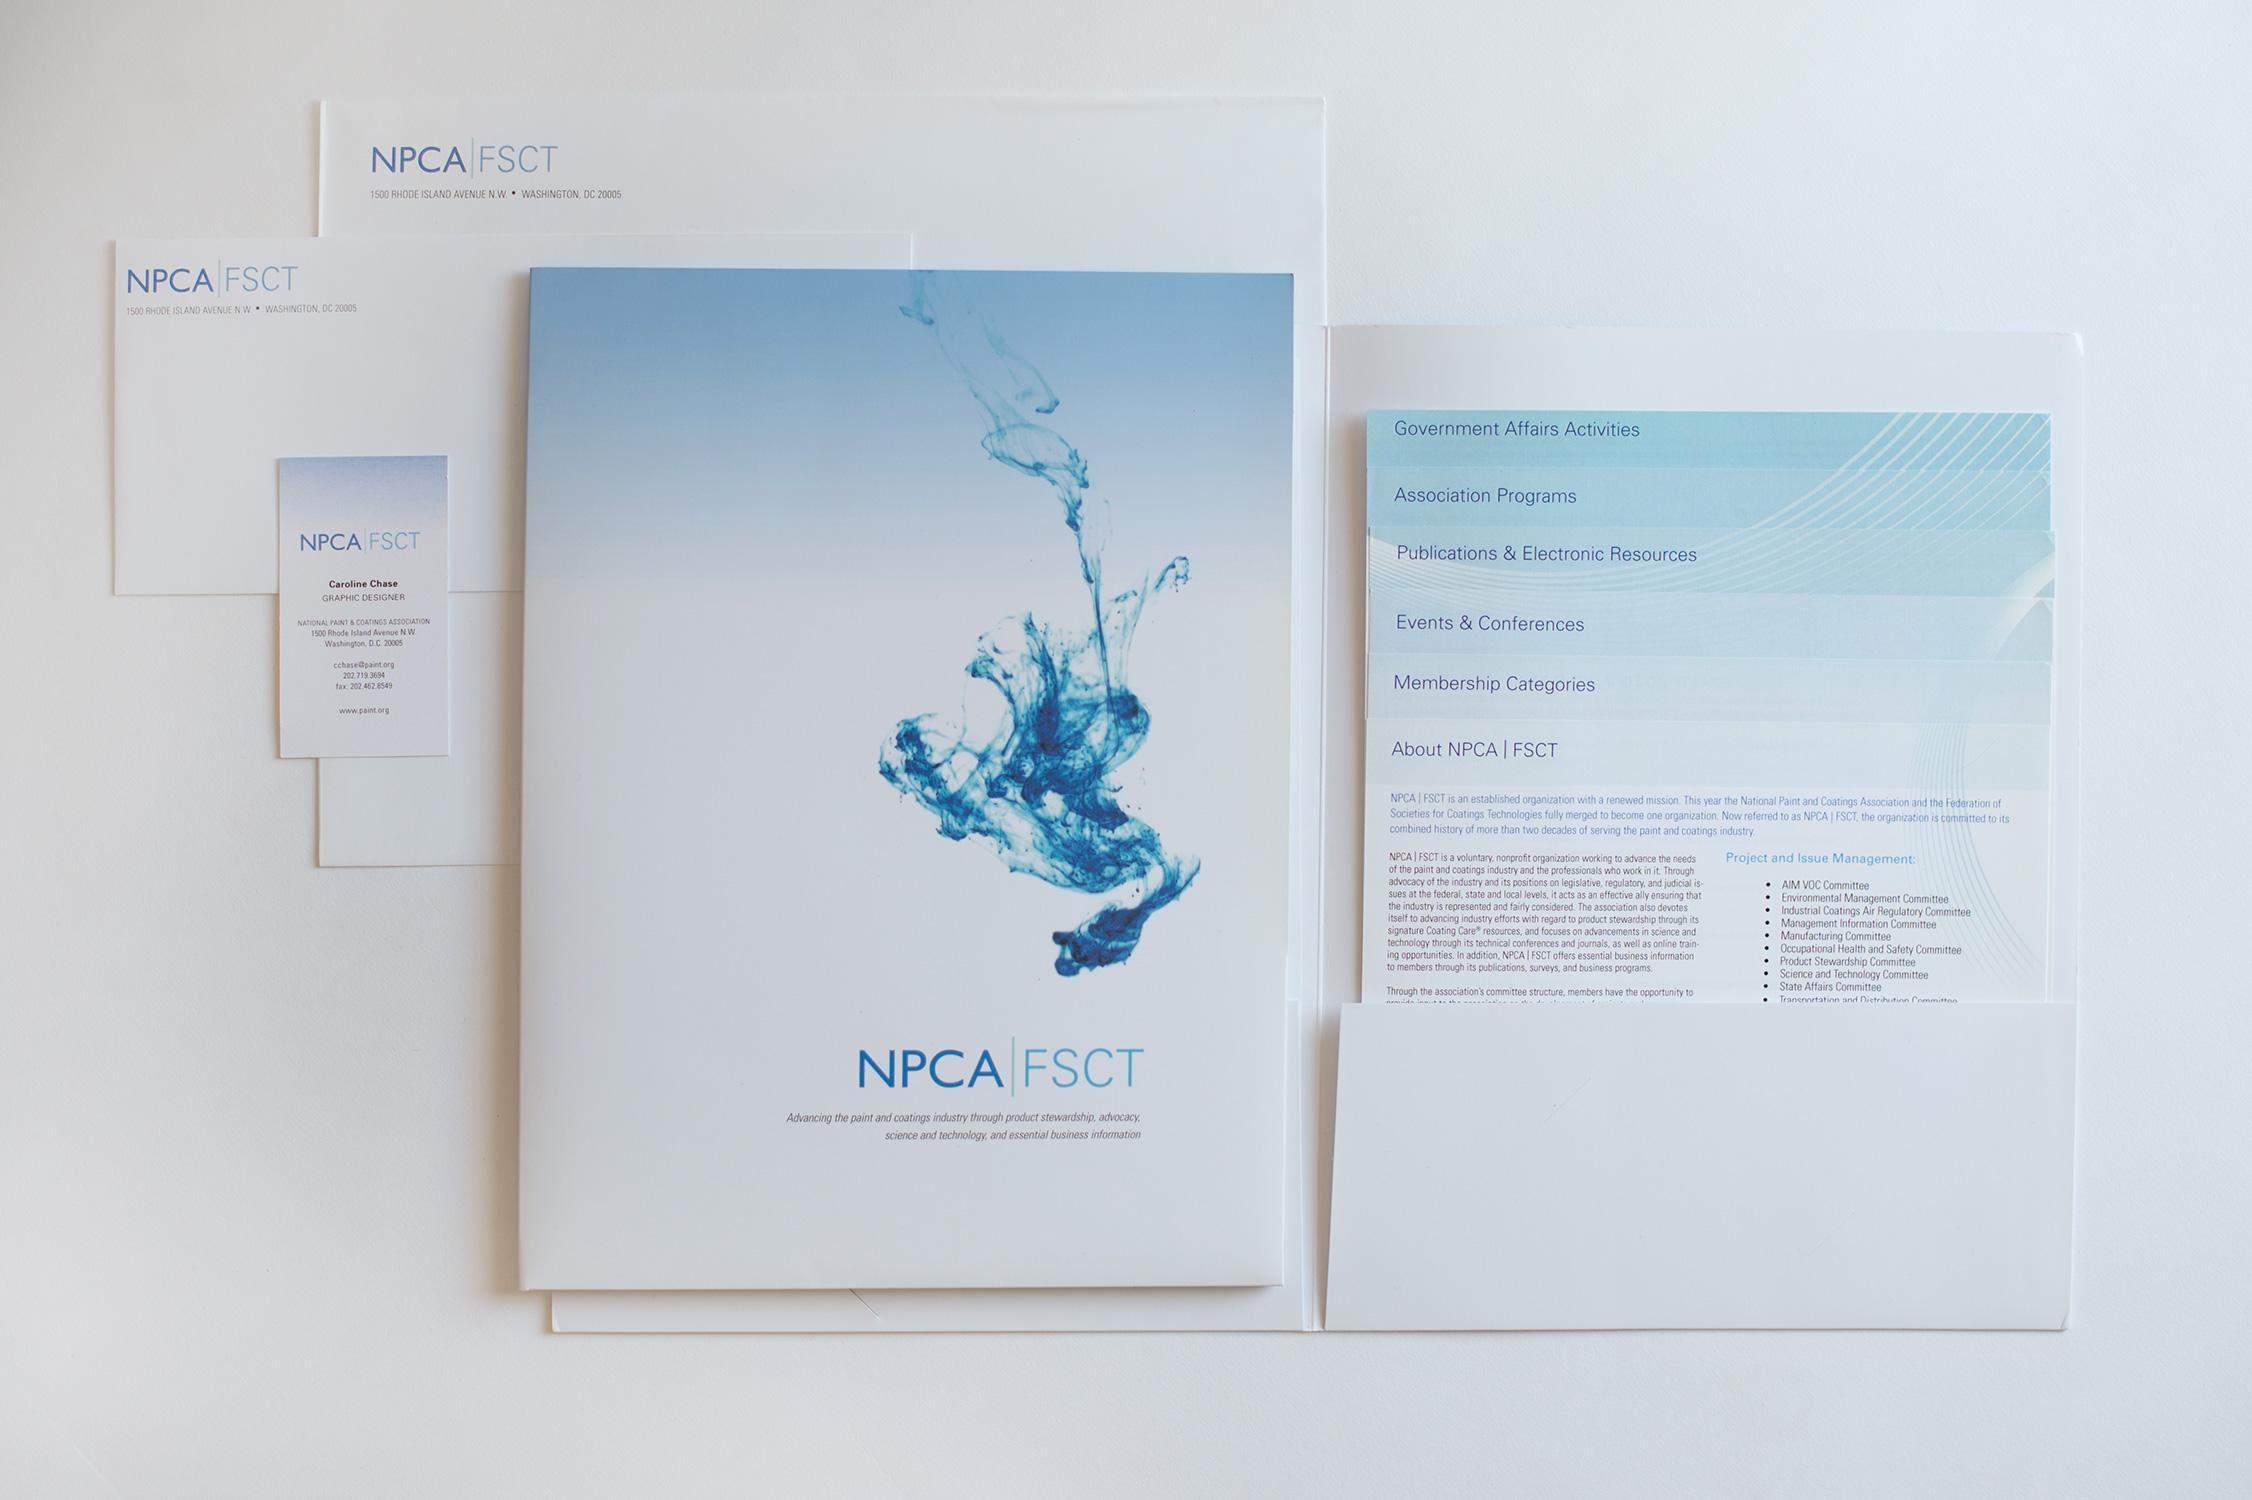 NPCAfsctFolderidenity_web.jpg